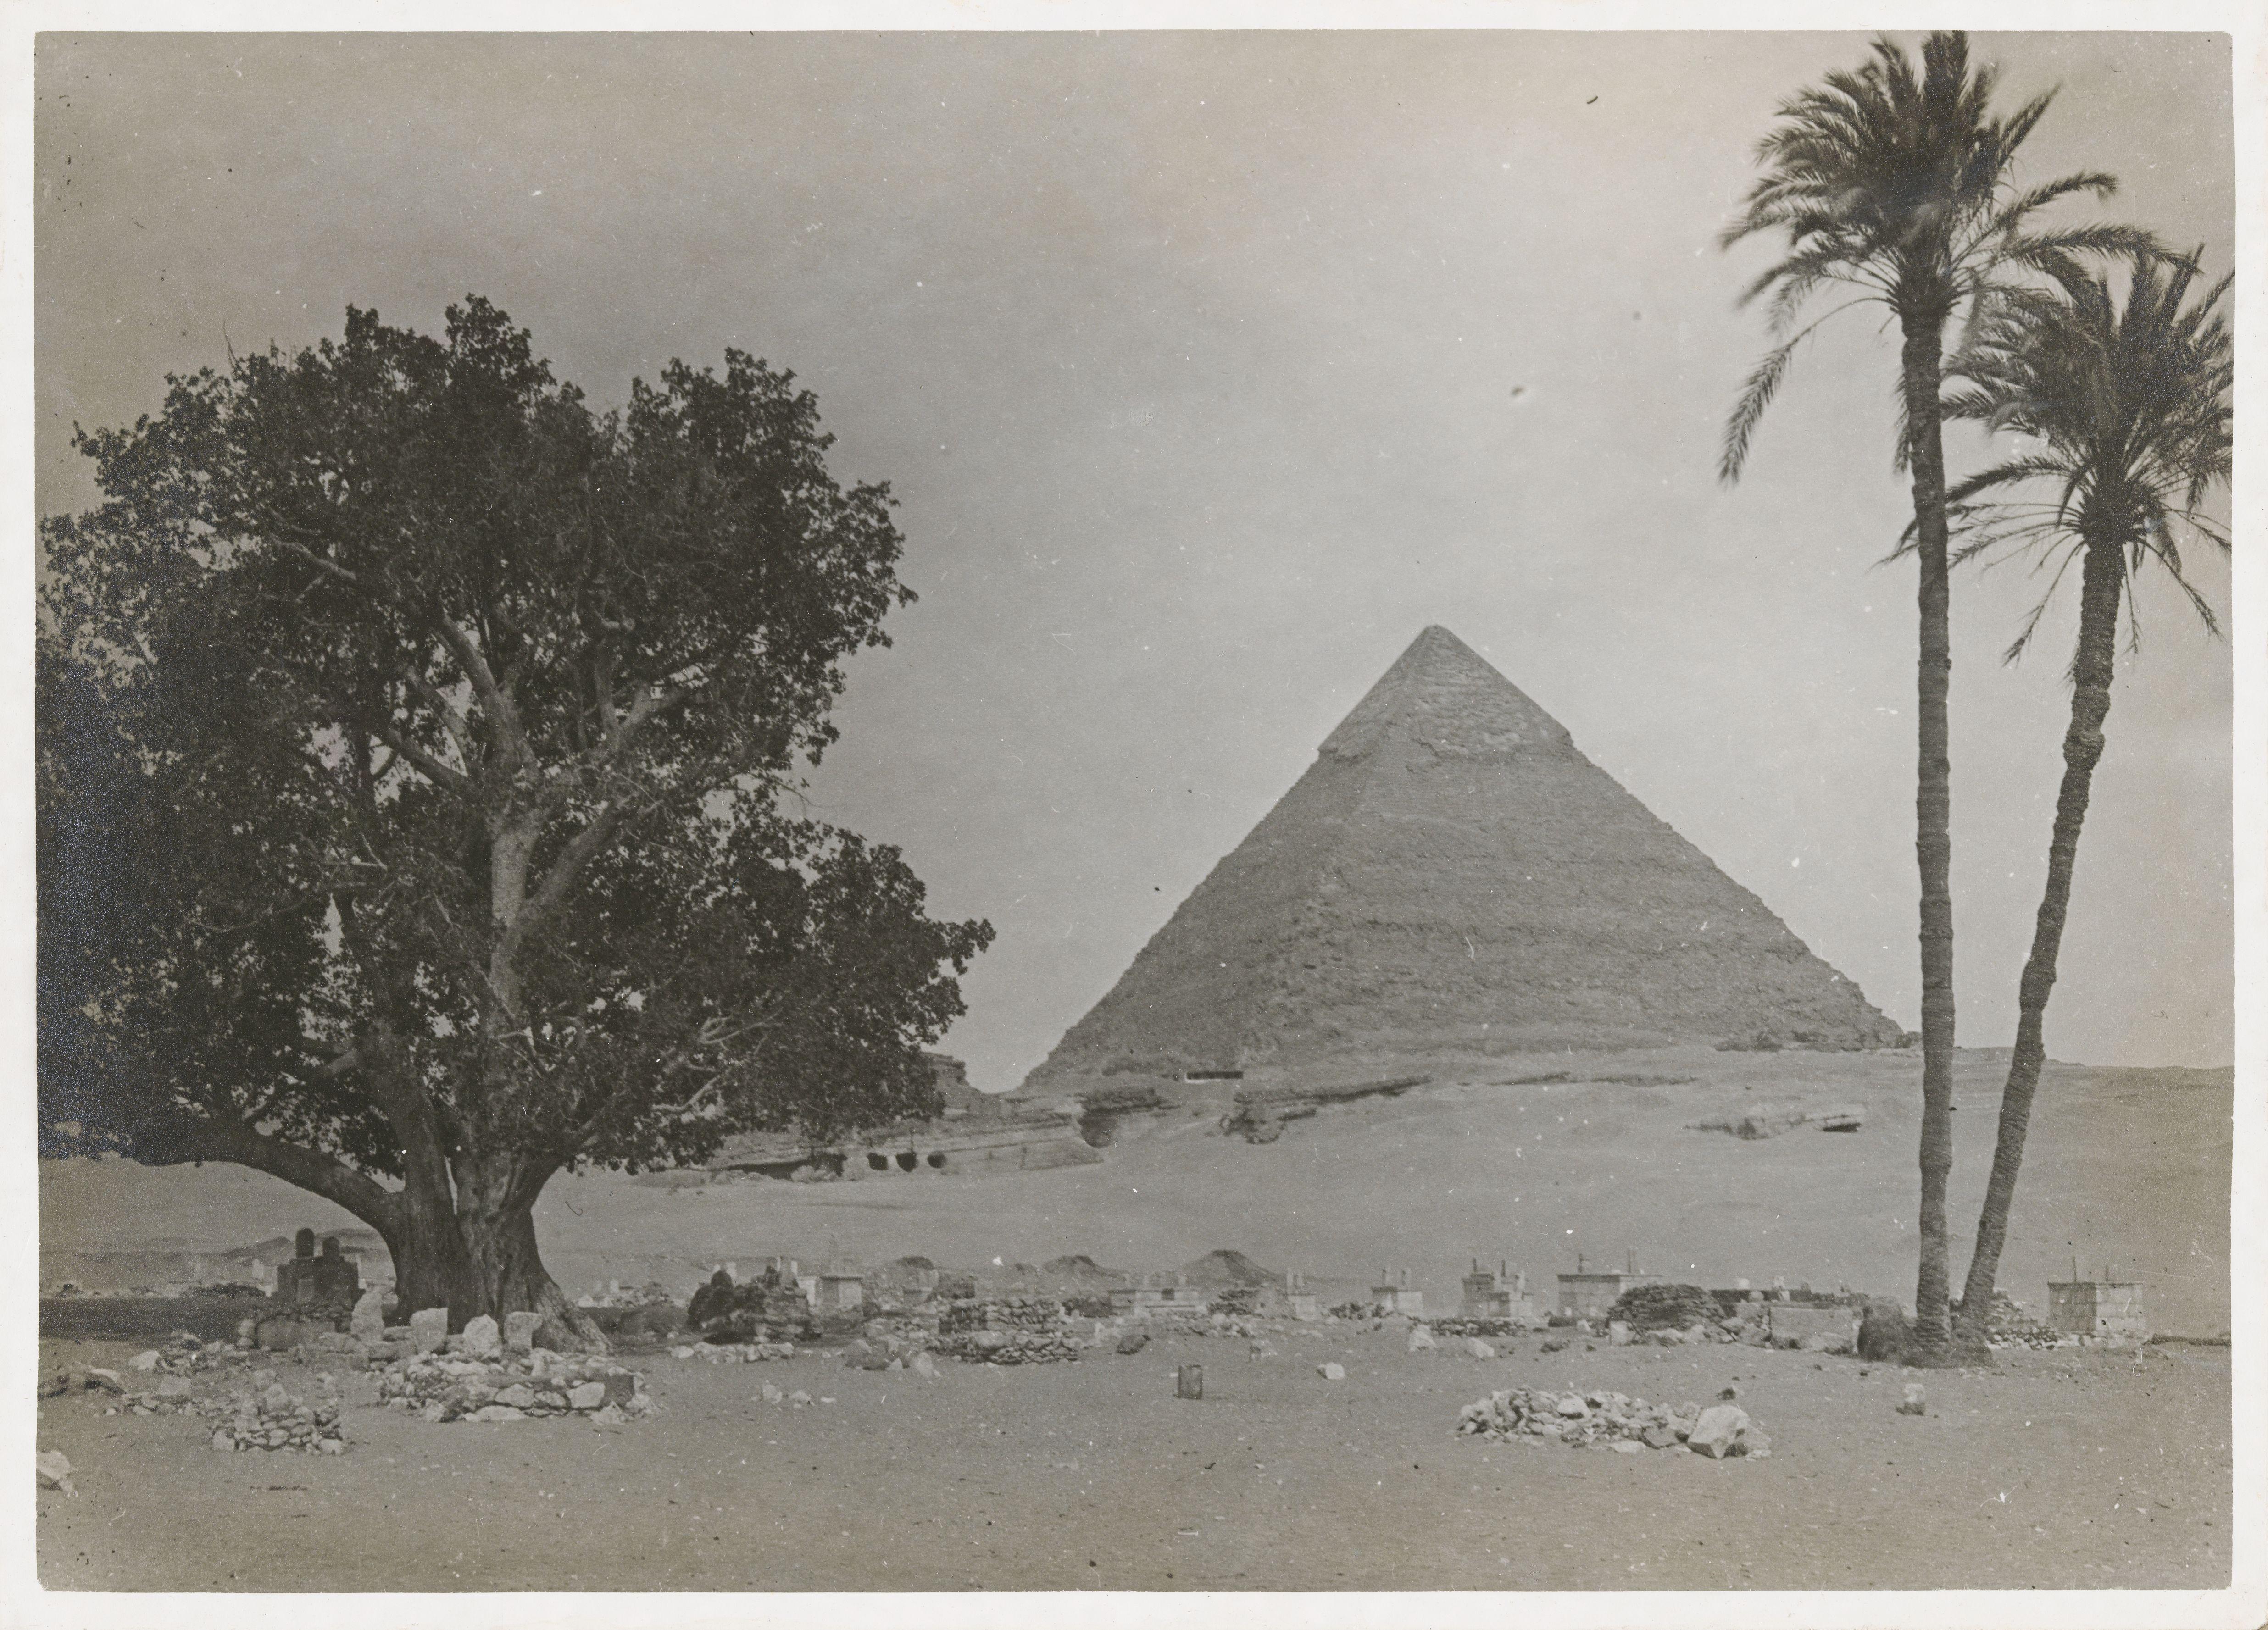 Гиза. Пирамида Хеопса, на переднем плане арабское кладбище